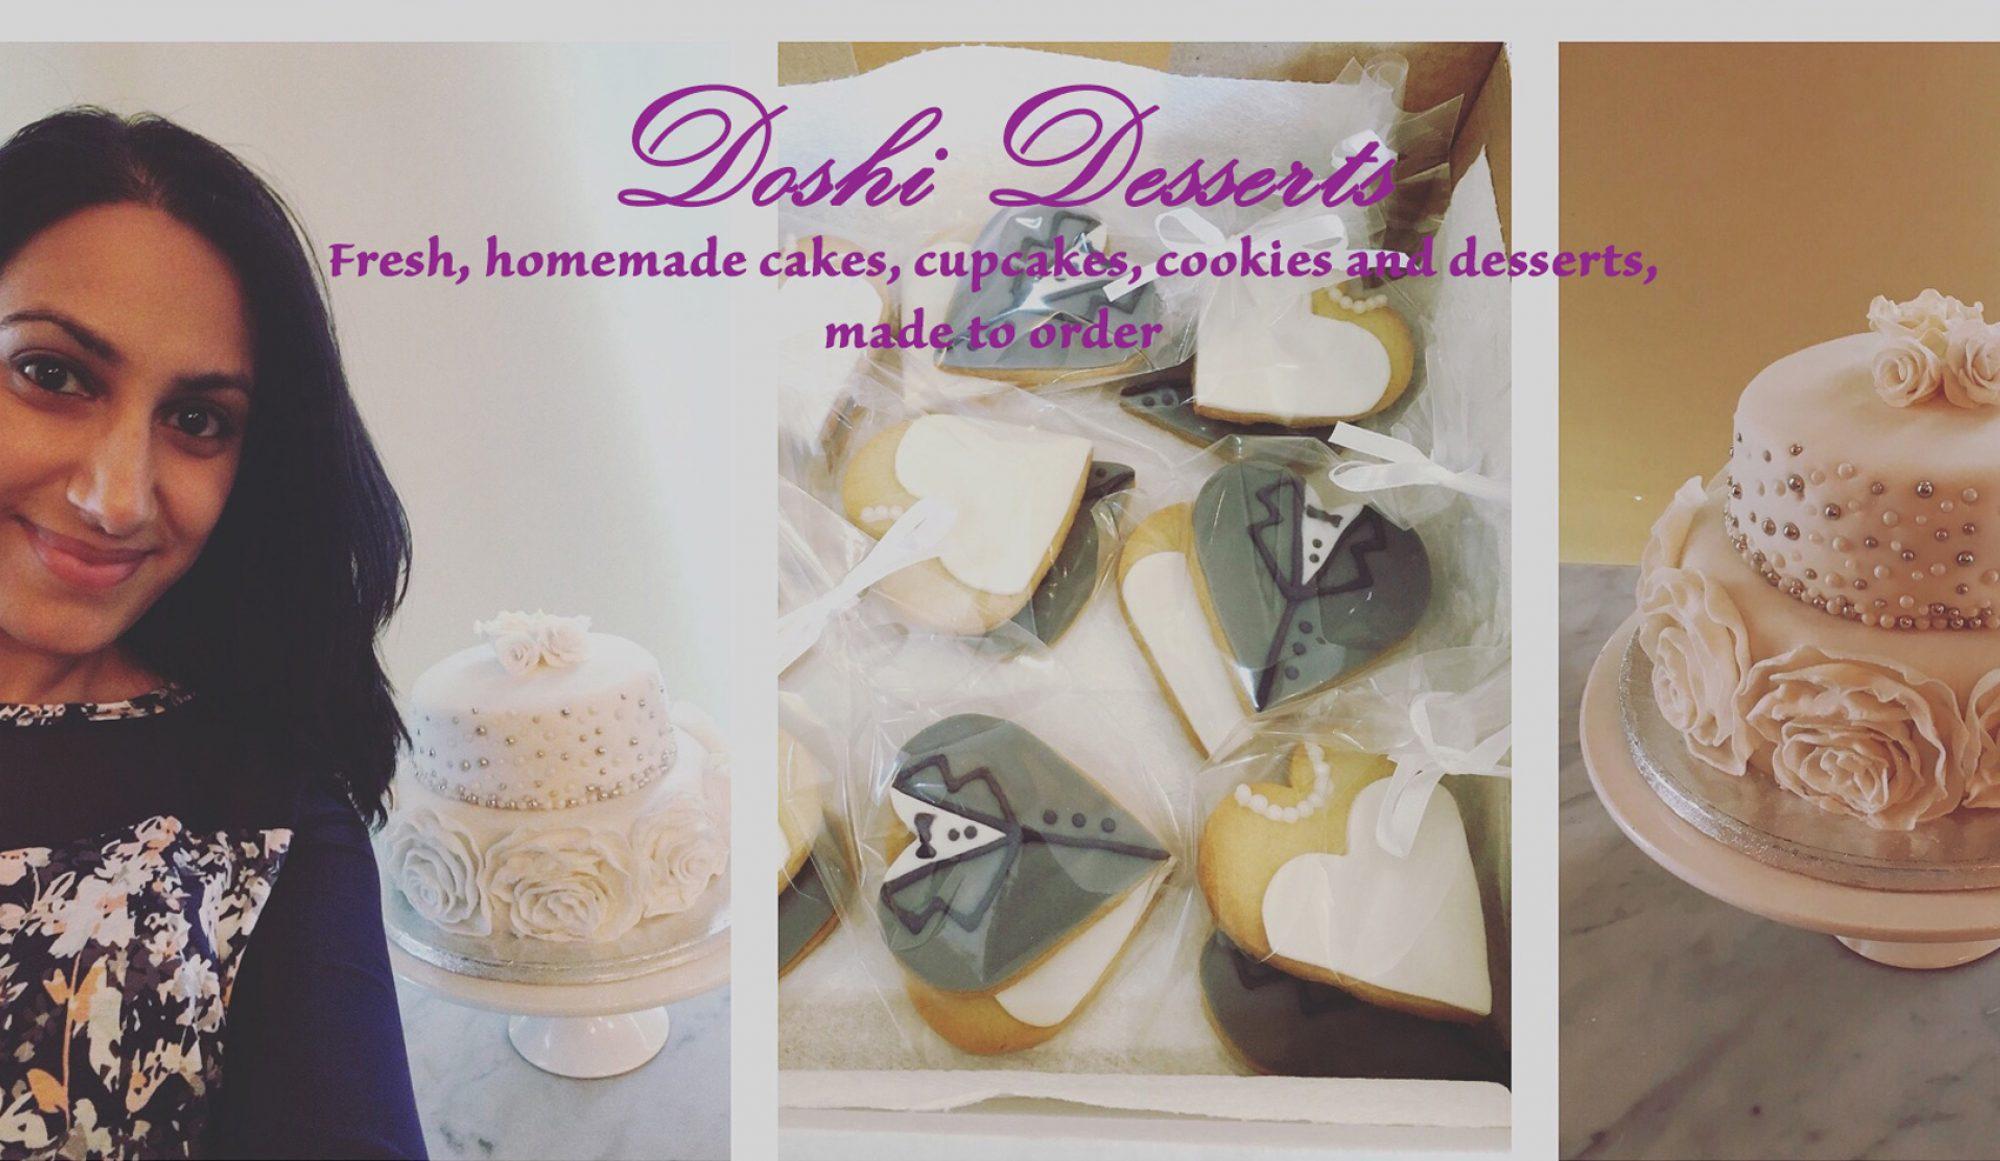 Doshi Desserts